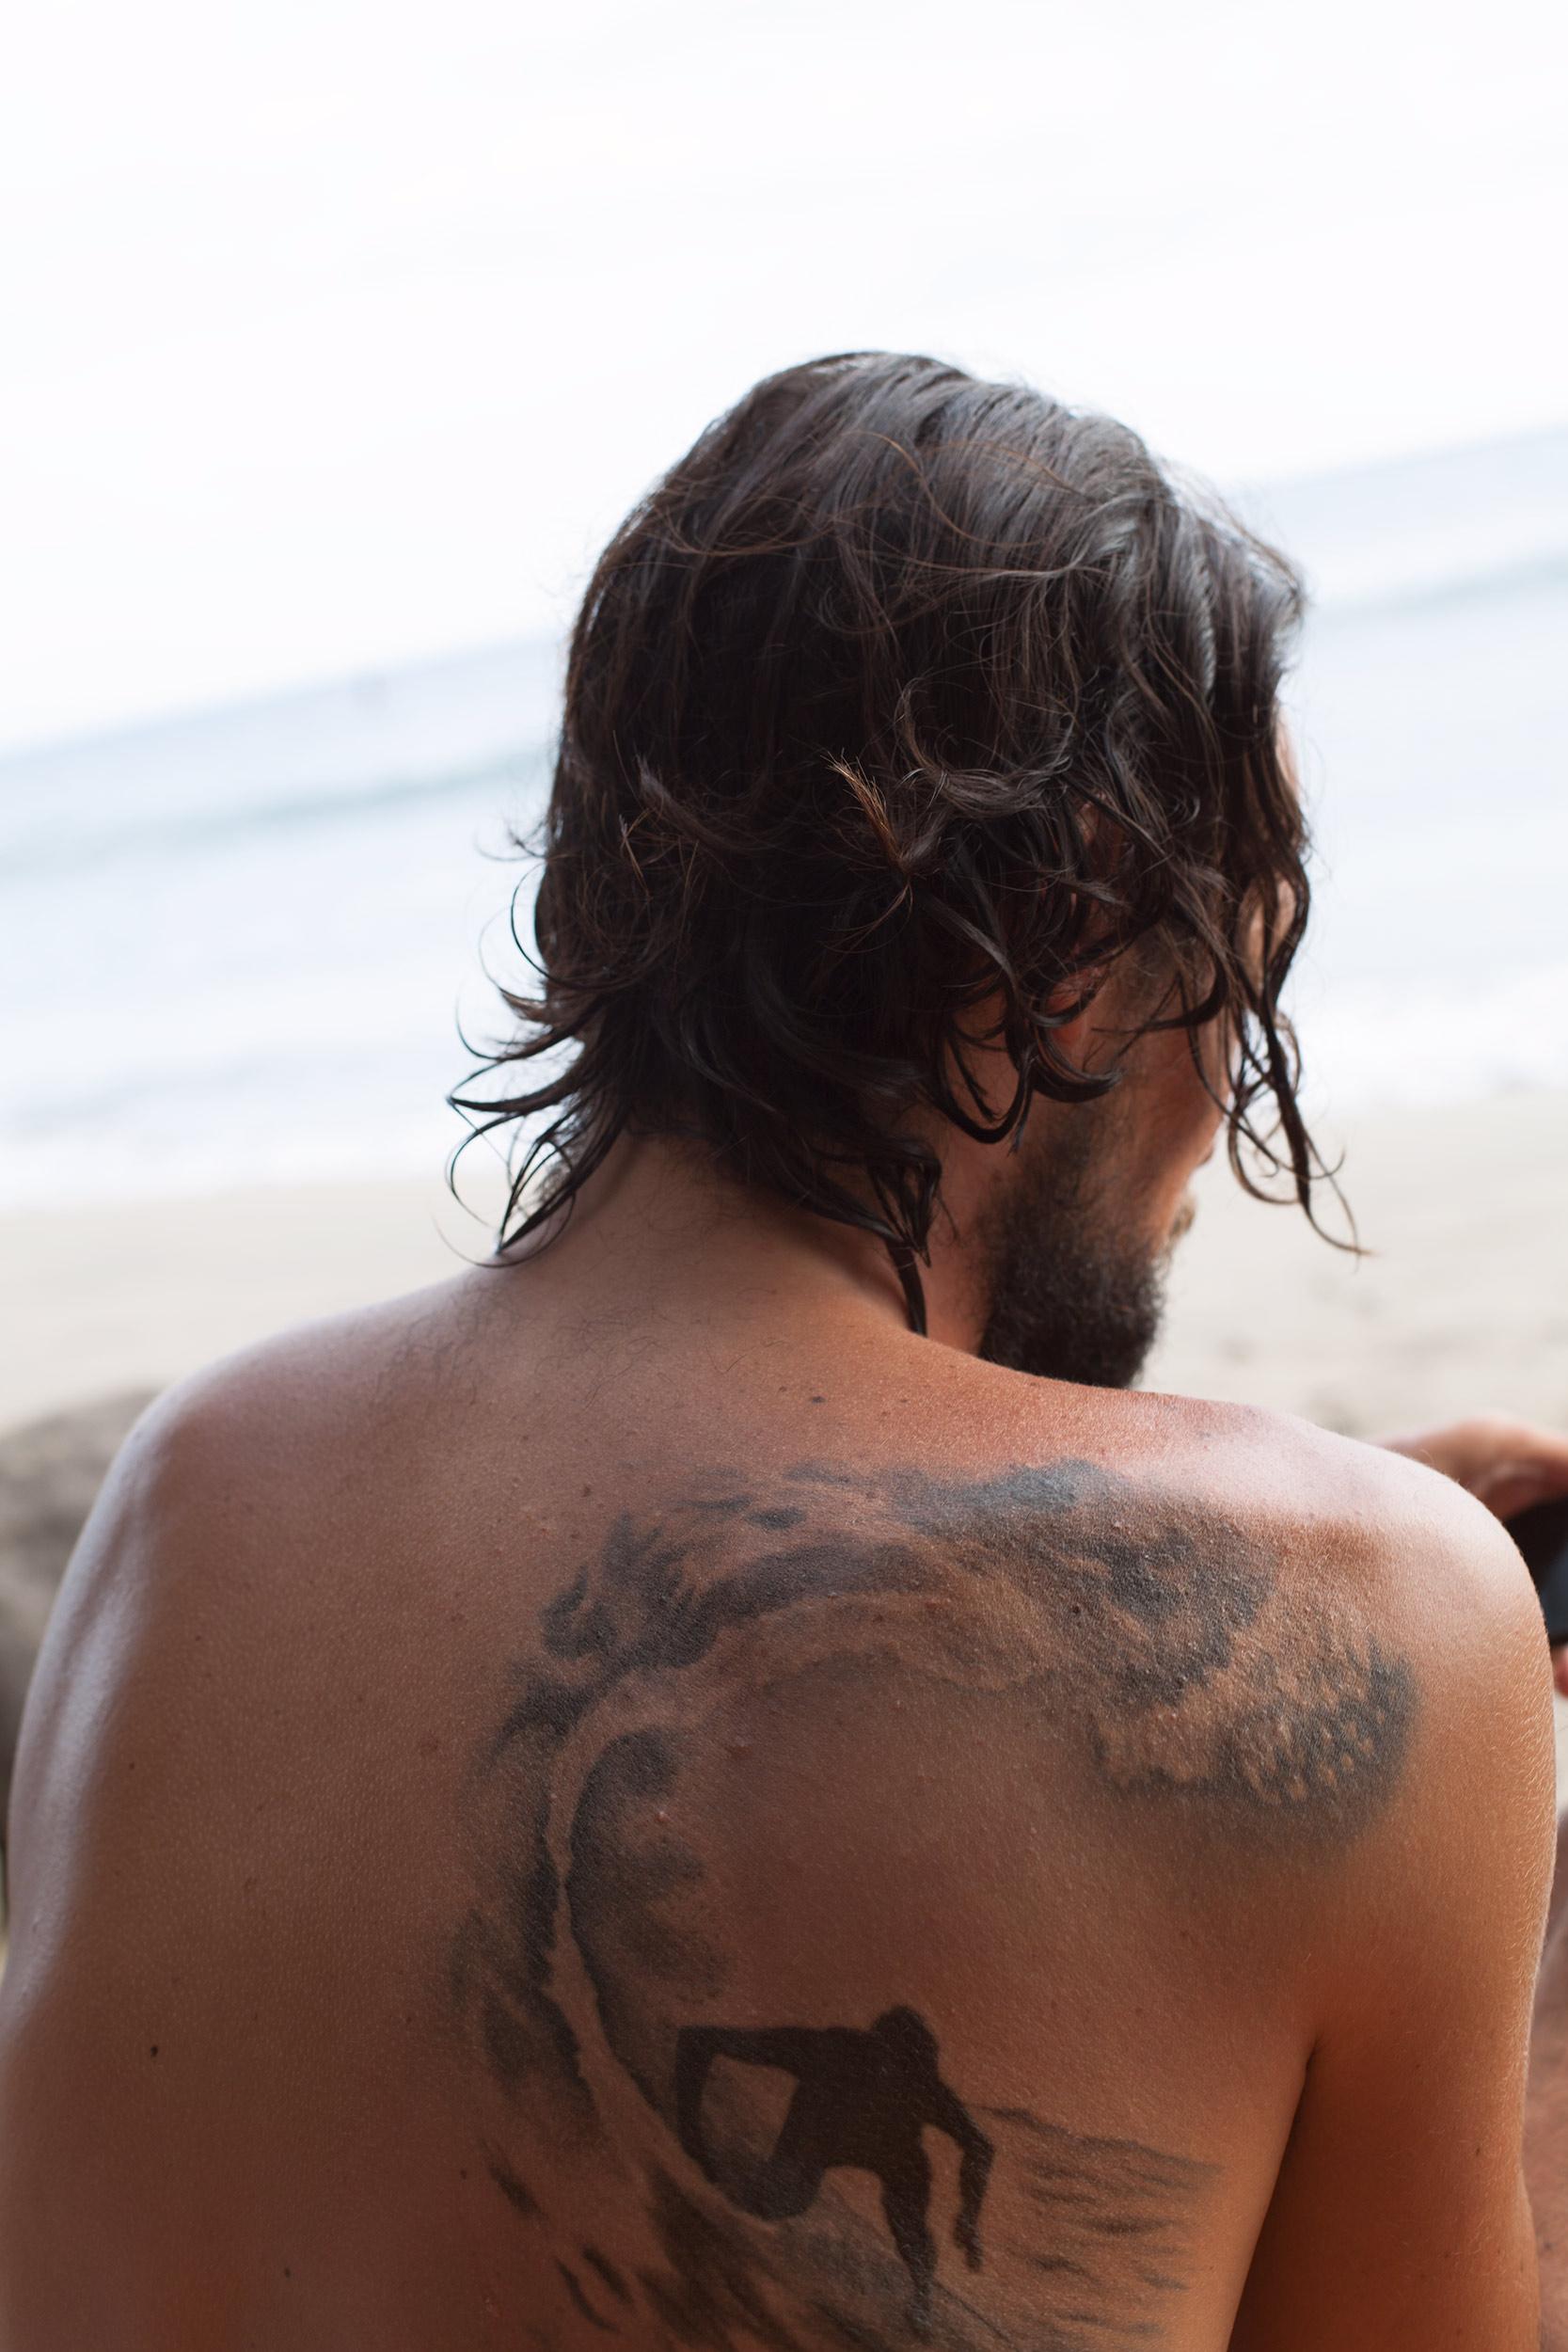 tattoo-surf-Maui-Hawaii-surfer.jpg